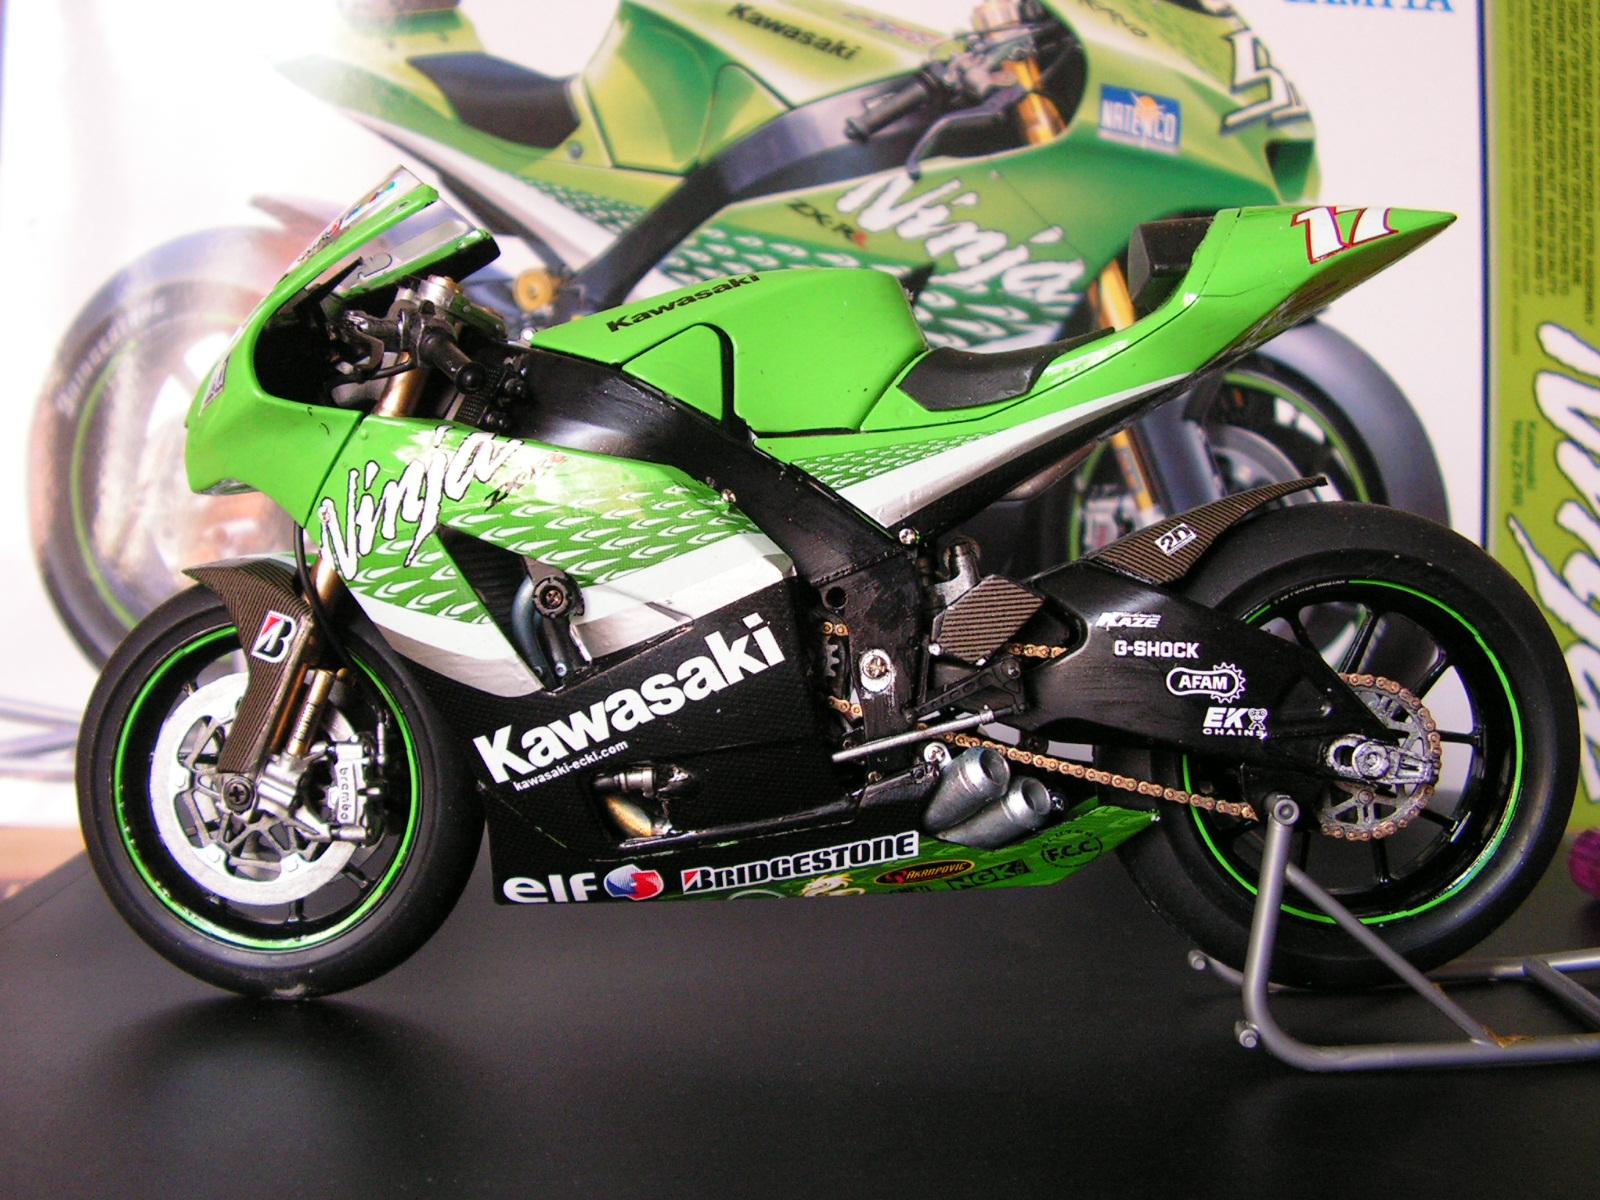 Kawasaki Ninja Rr Modifikasi